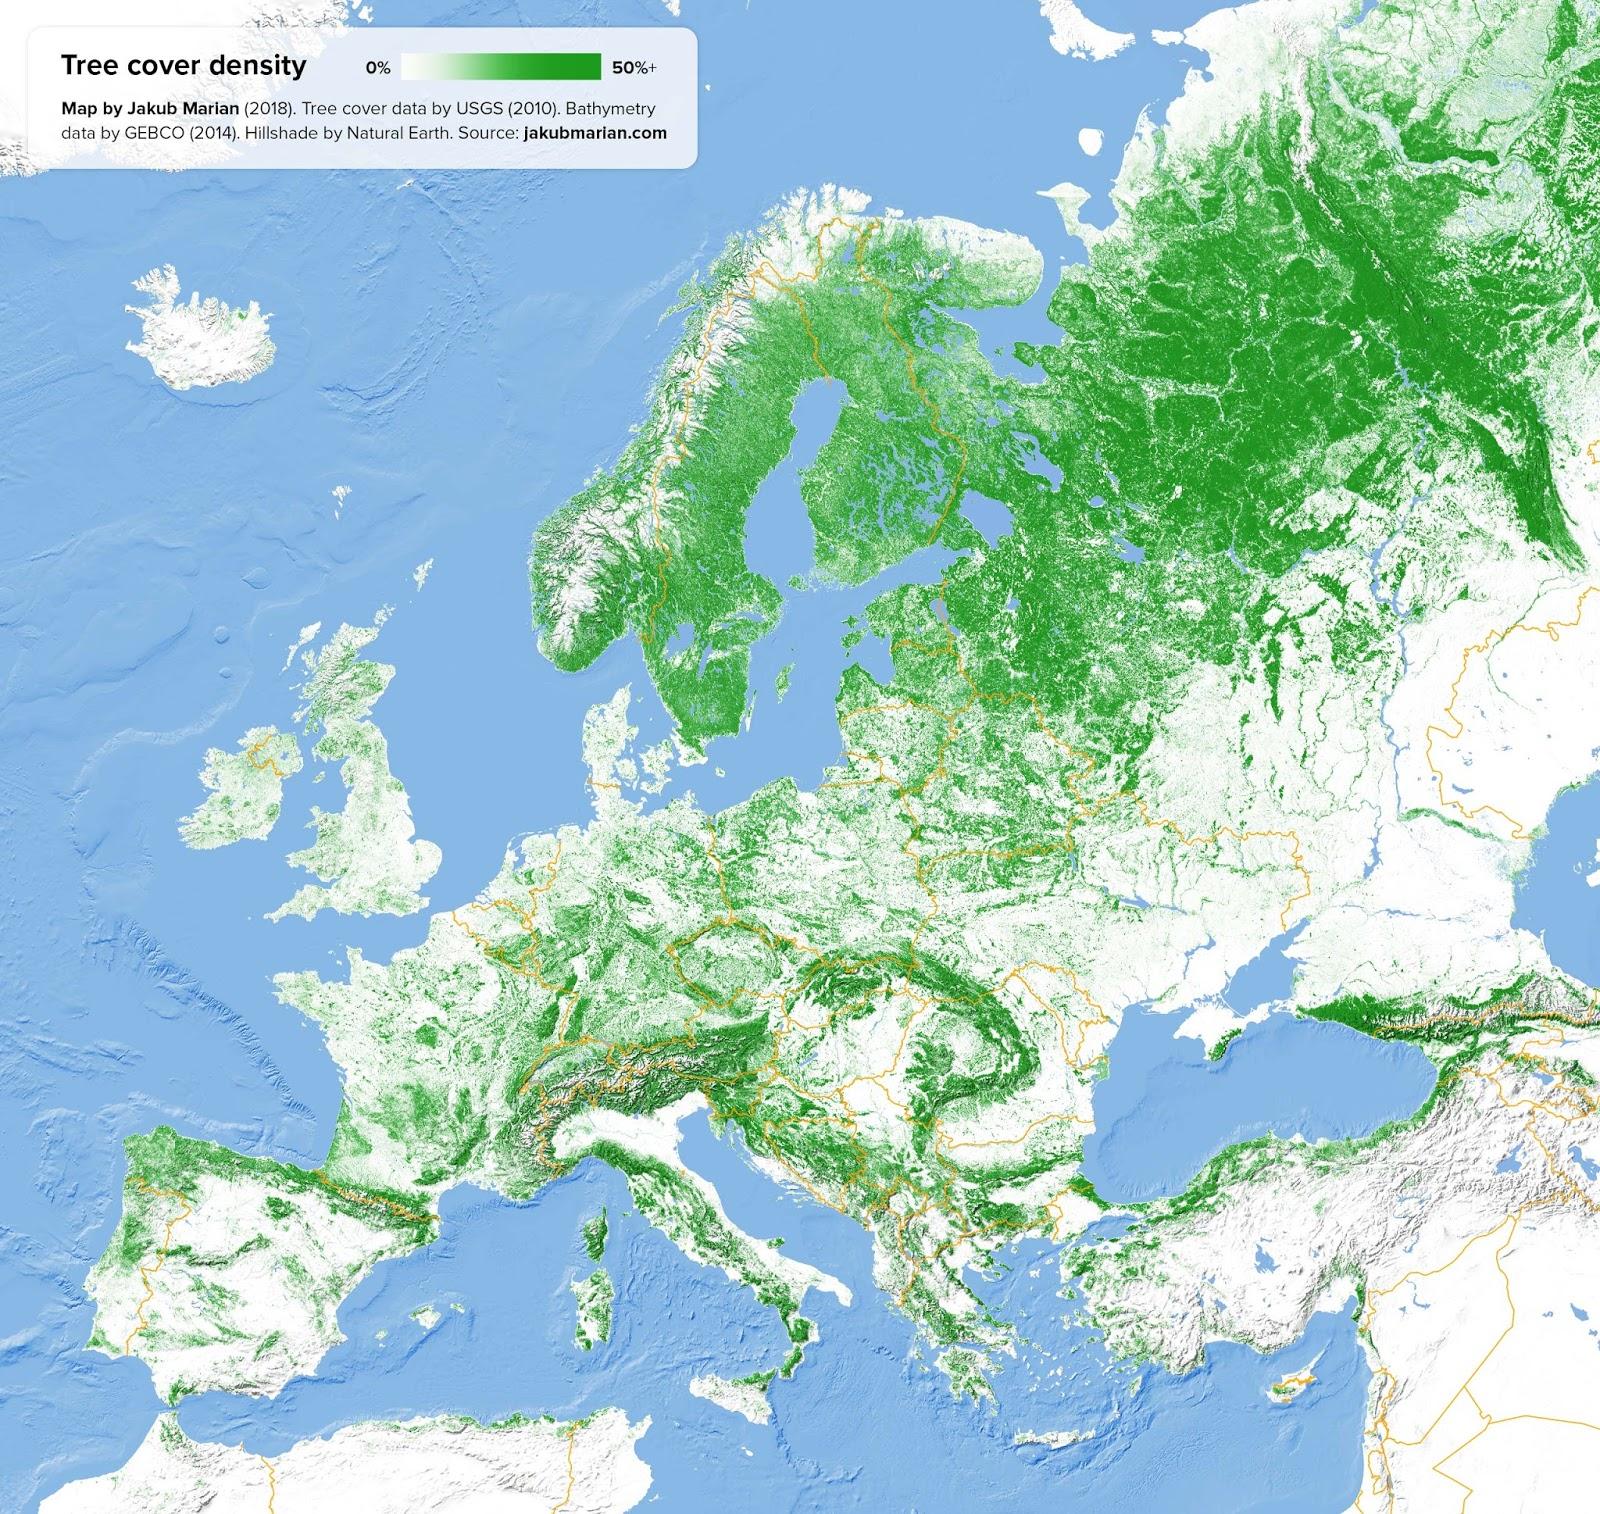 tree cover density of europe